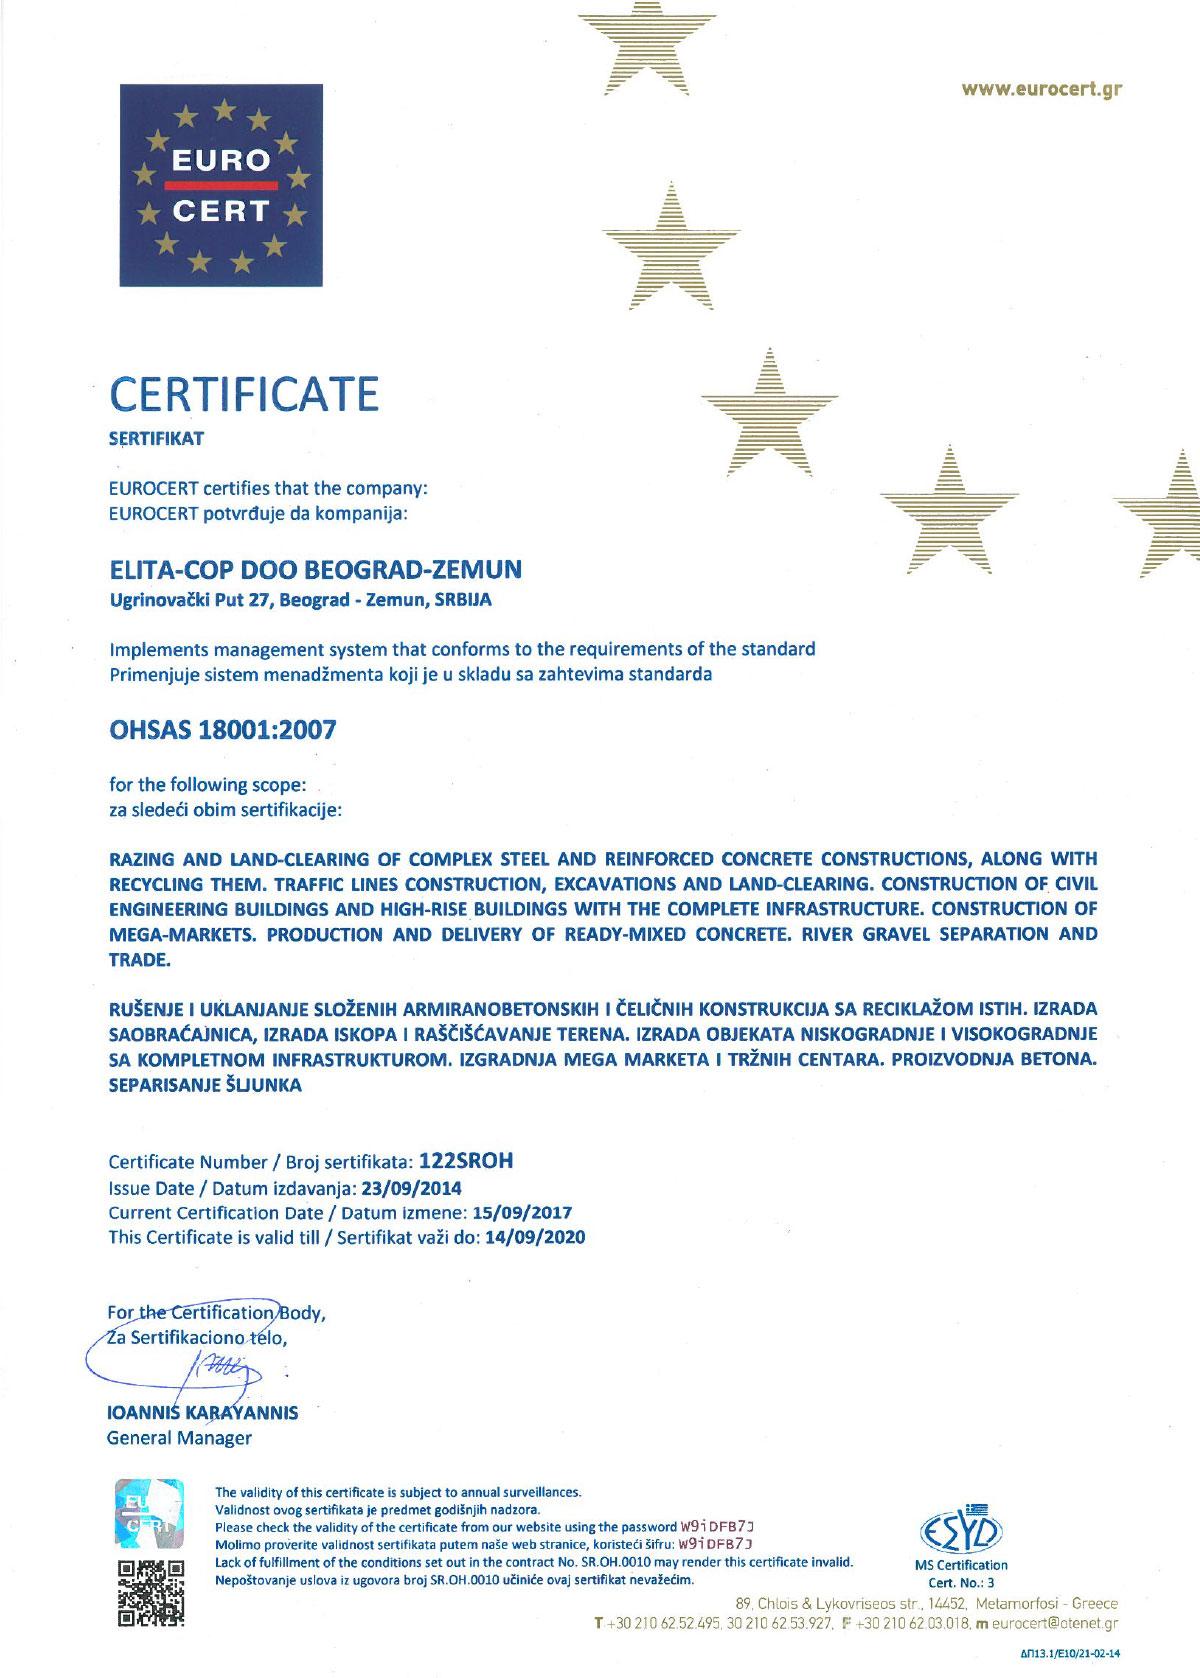 Elita Cop ISO 18001:2007